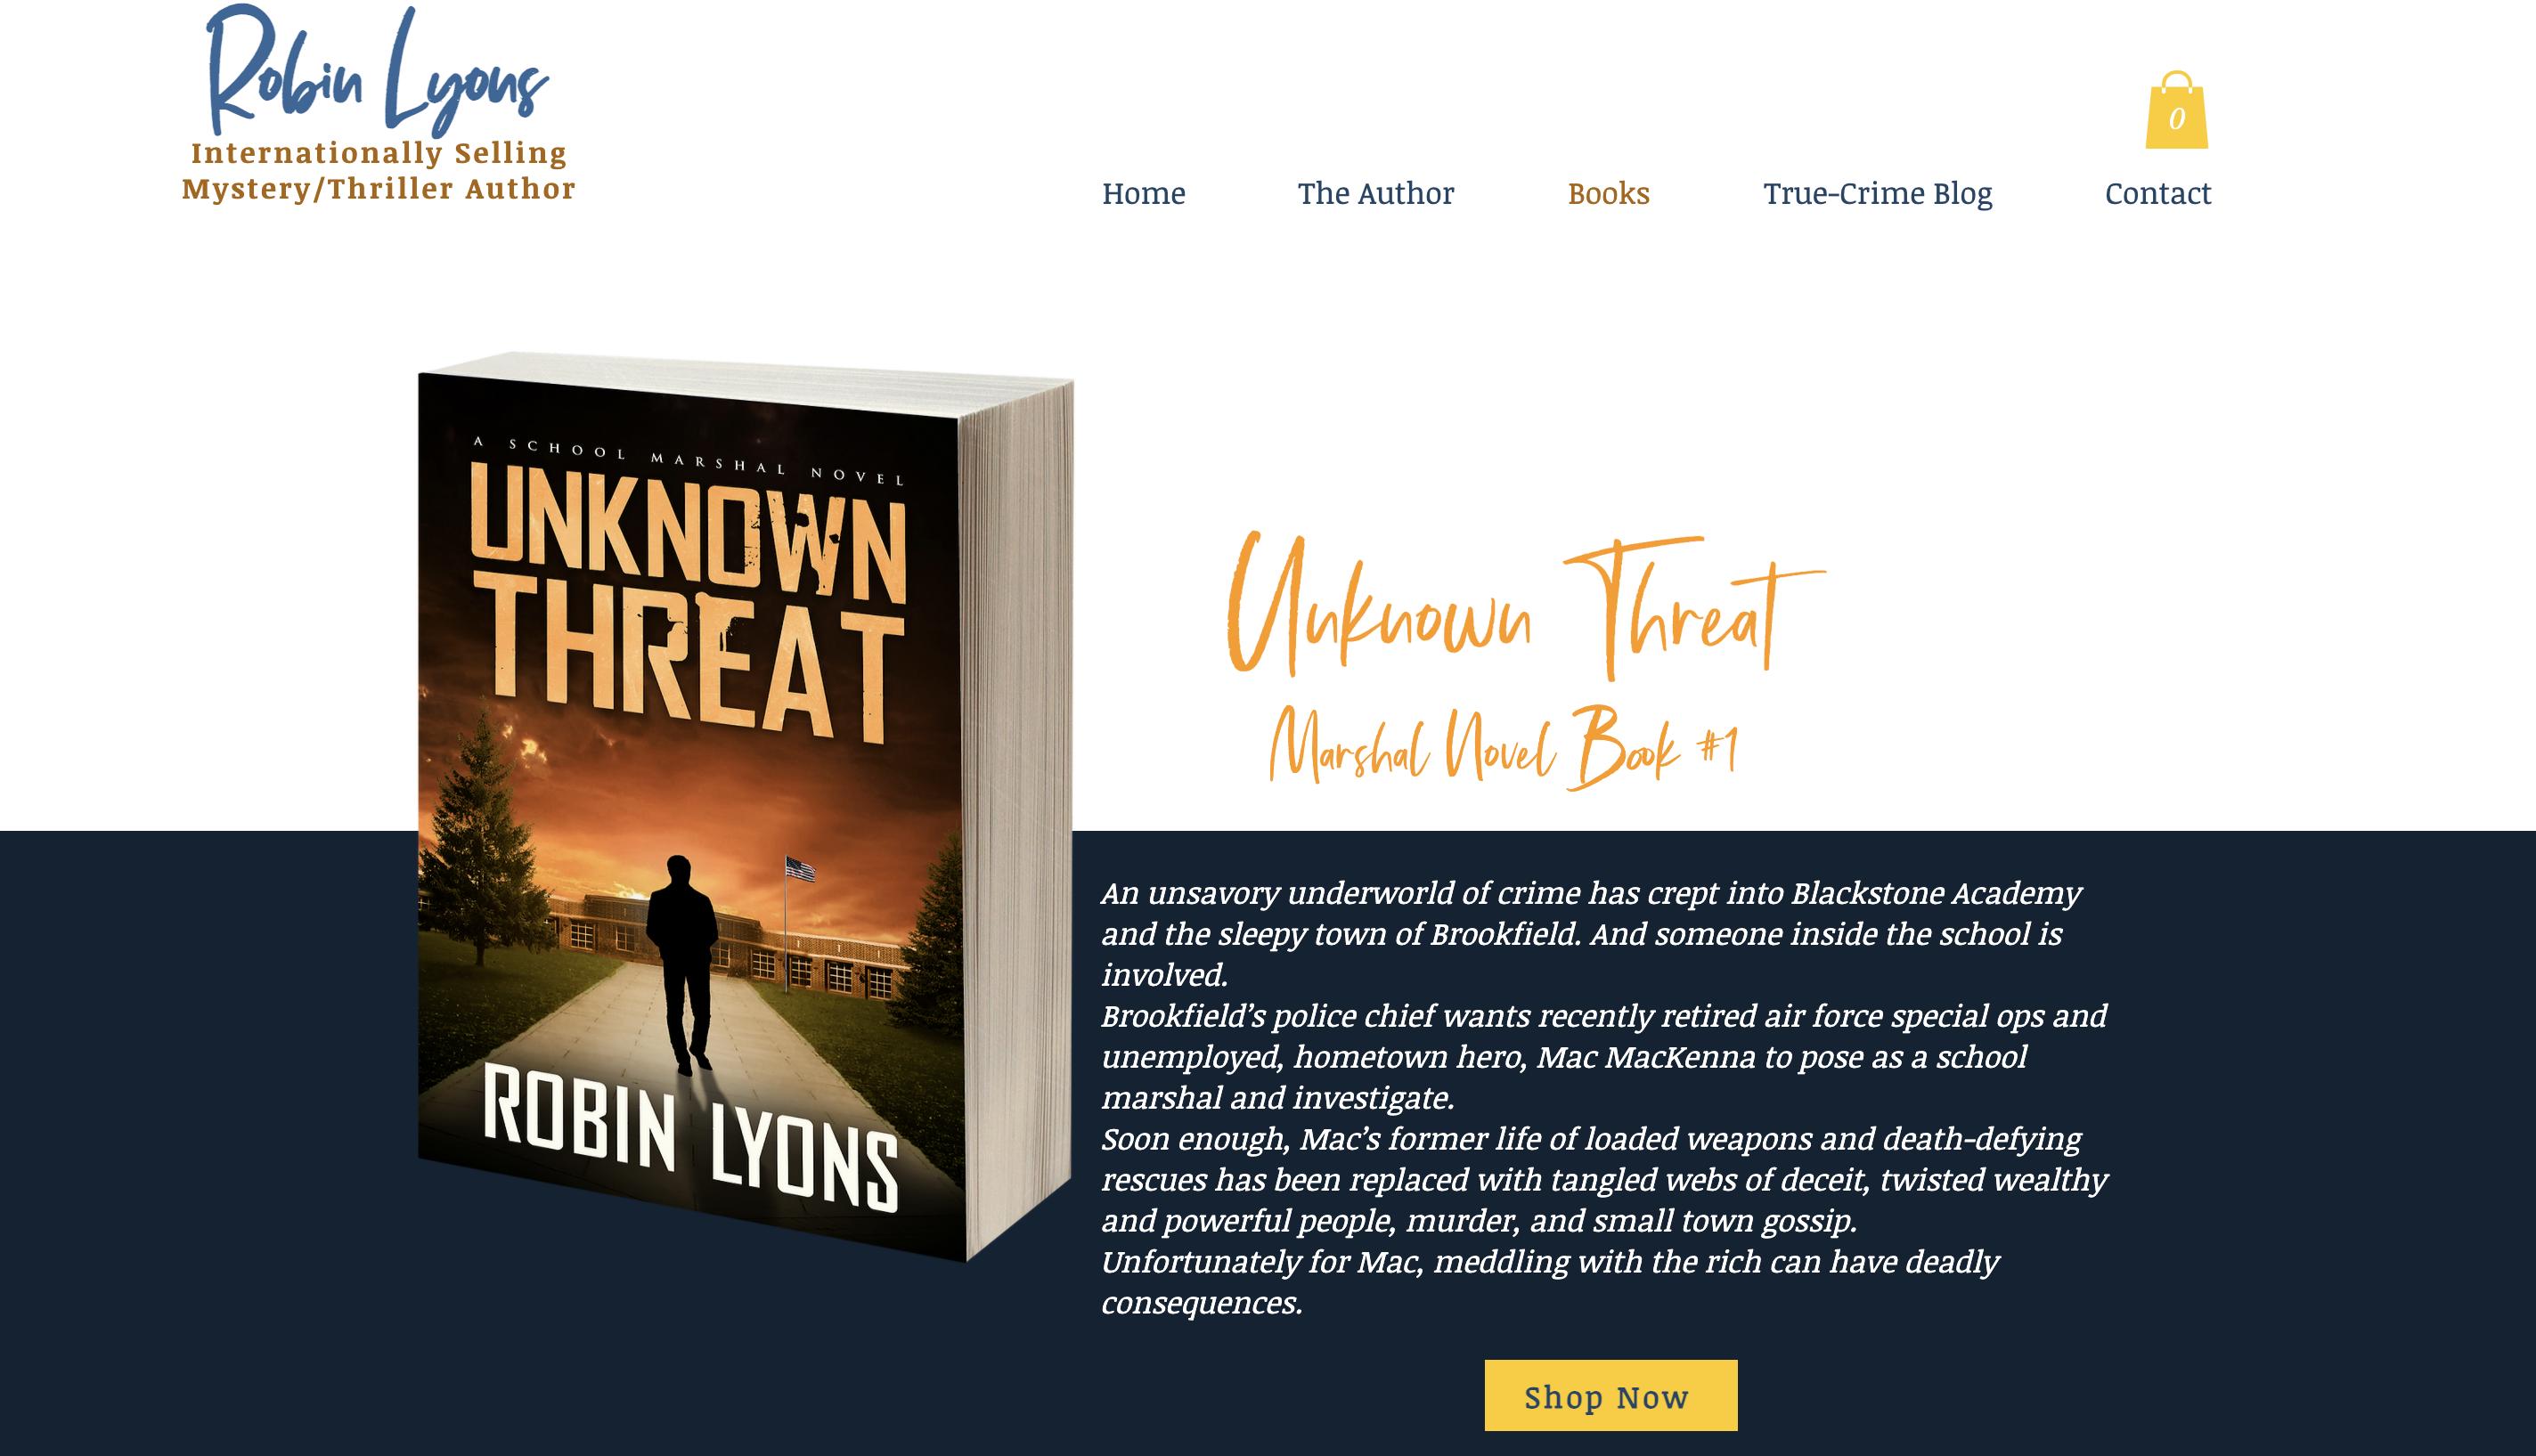 Literary Work Robin Lyons, the author.